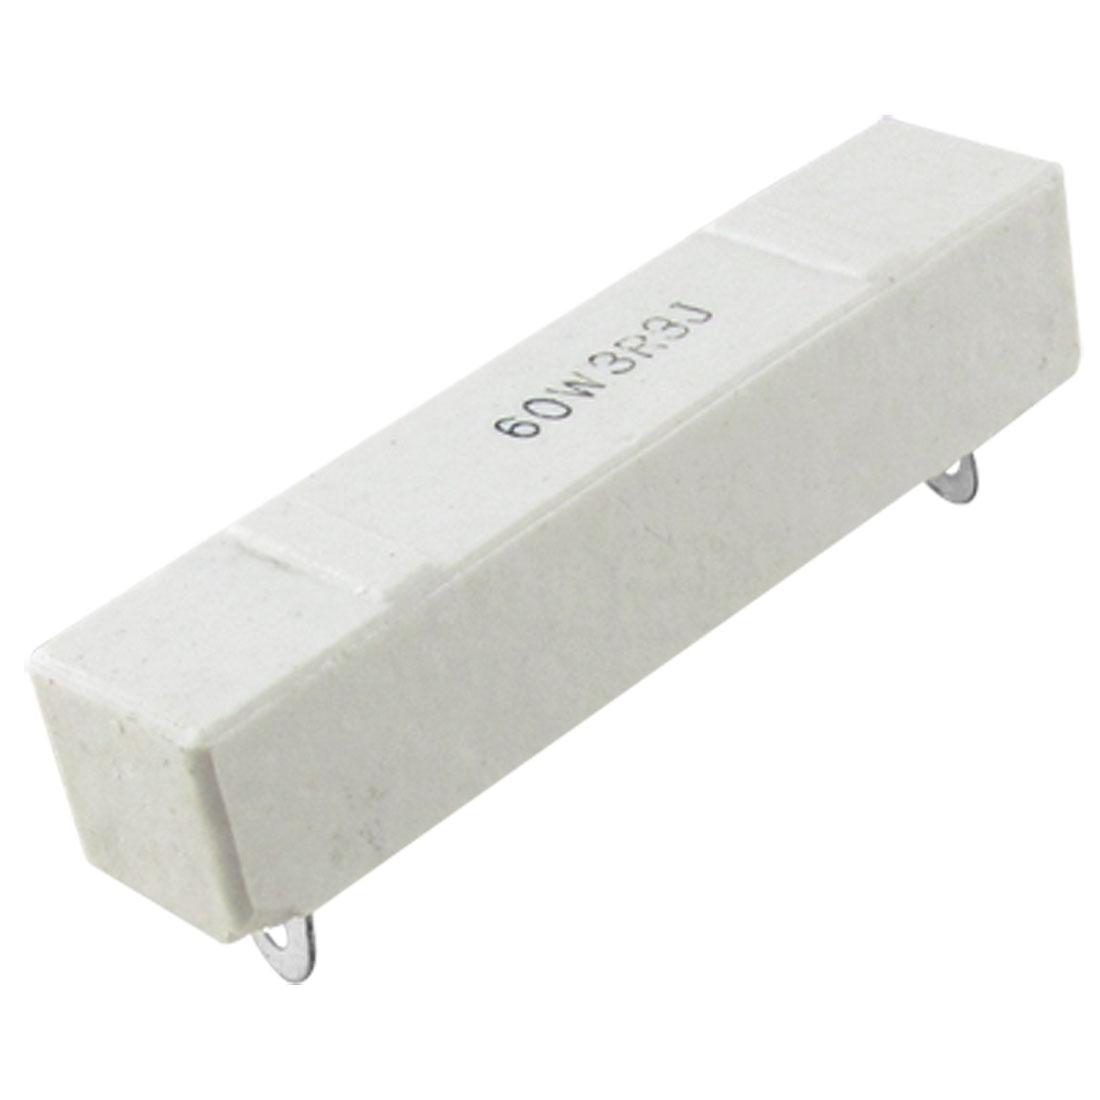 60W 3.3 Ohm DIP Wirewound Ceramic Cement Resistor 3R3 5%